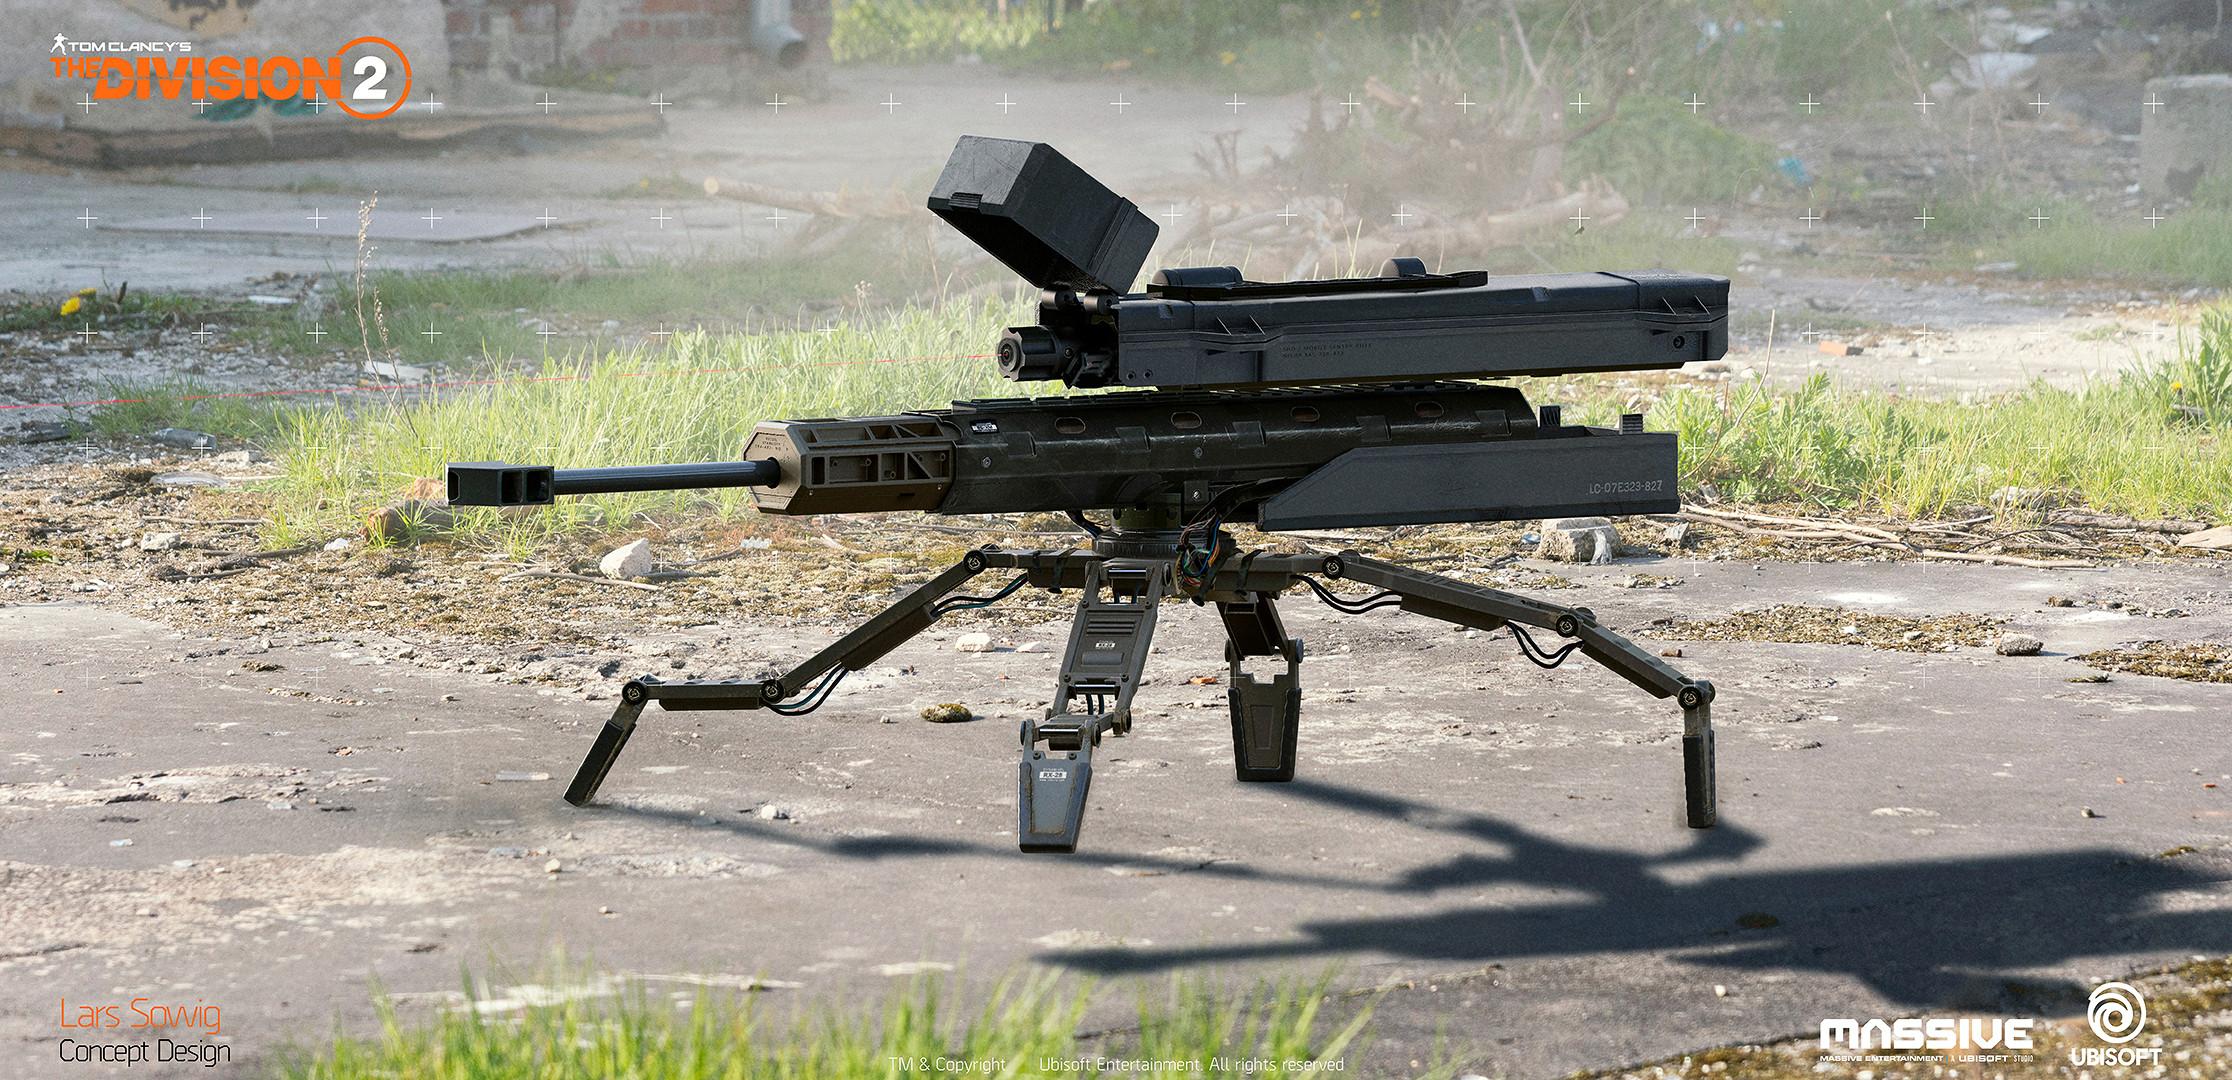 Sniper Turret Concept